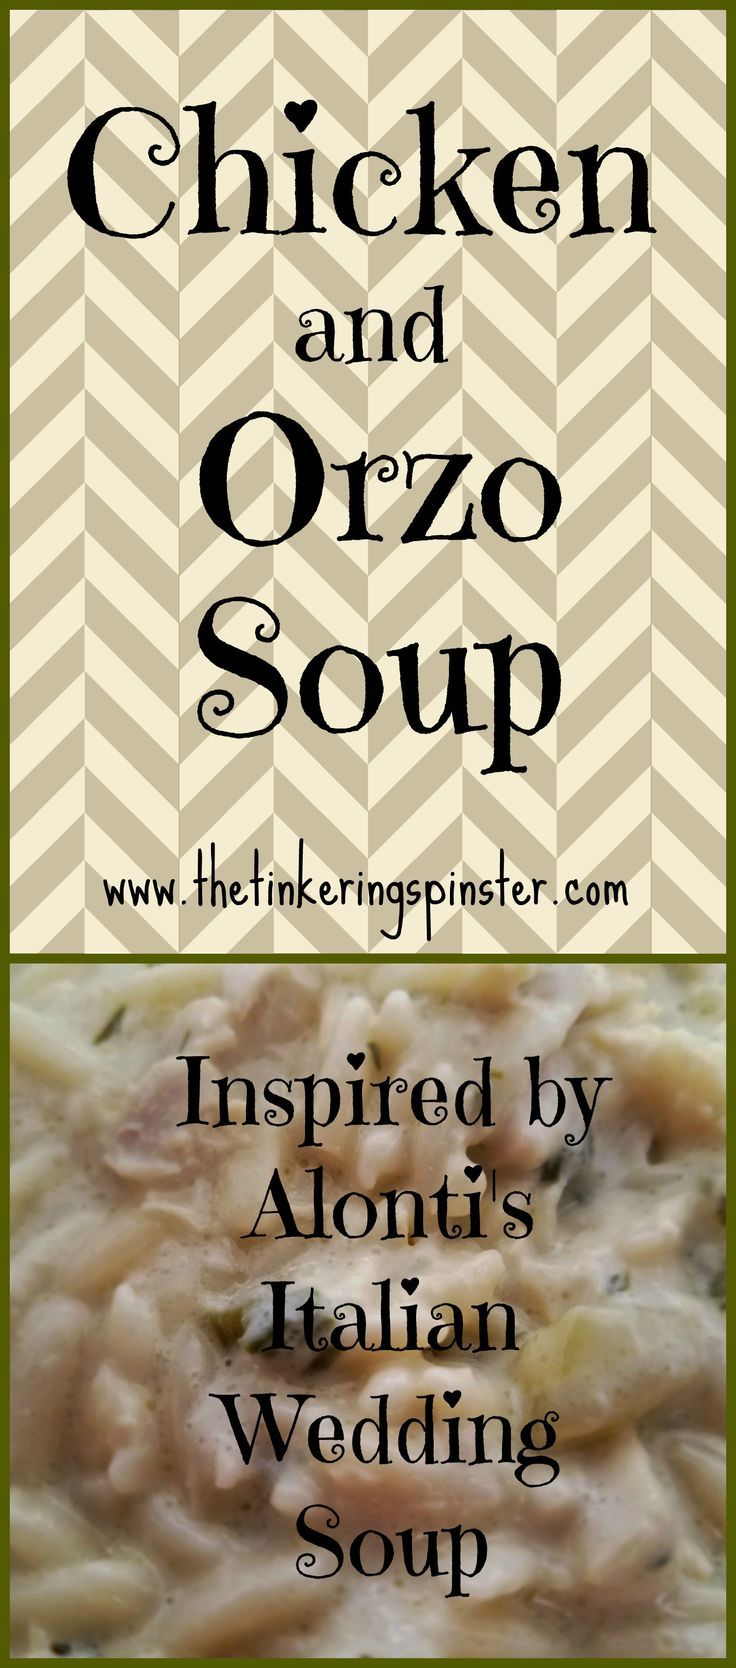 This is the best soup ever! #creambasedsoup #bestsoupever #italianweddingsoup #familyfavorites #alontihouston #orzo #chickenandorzo